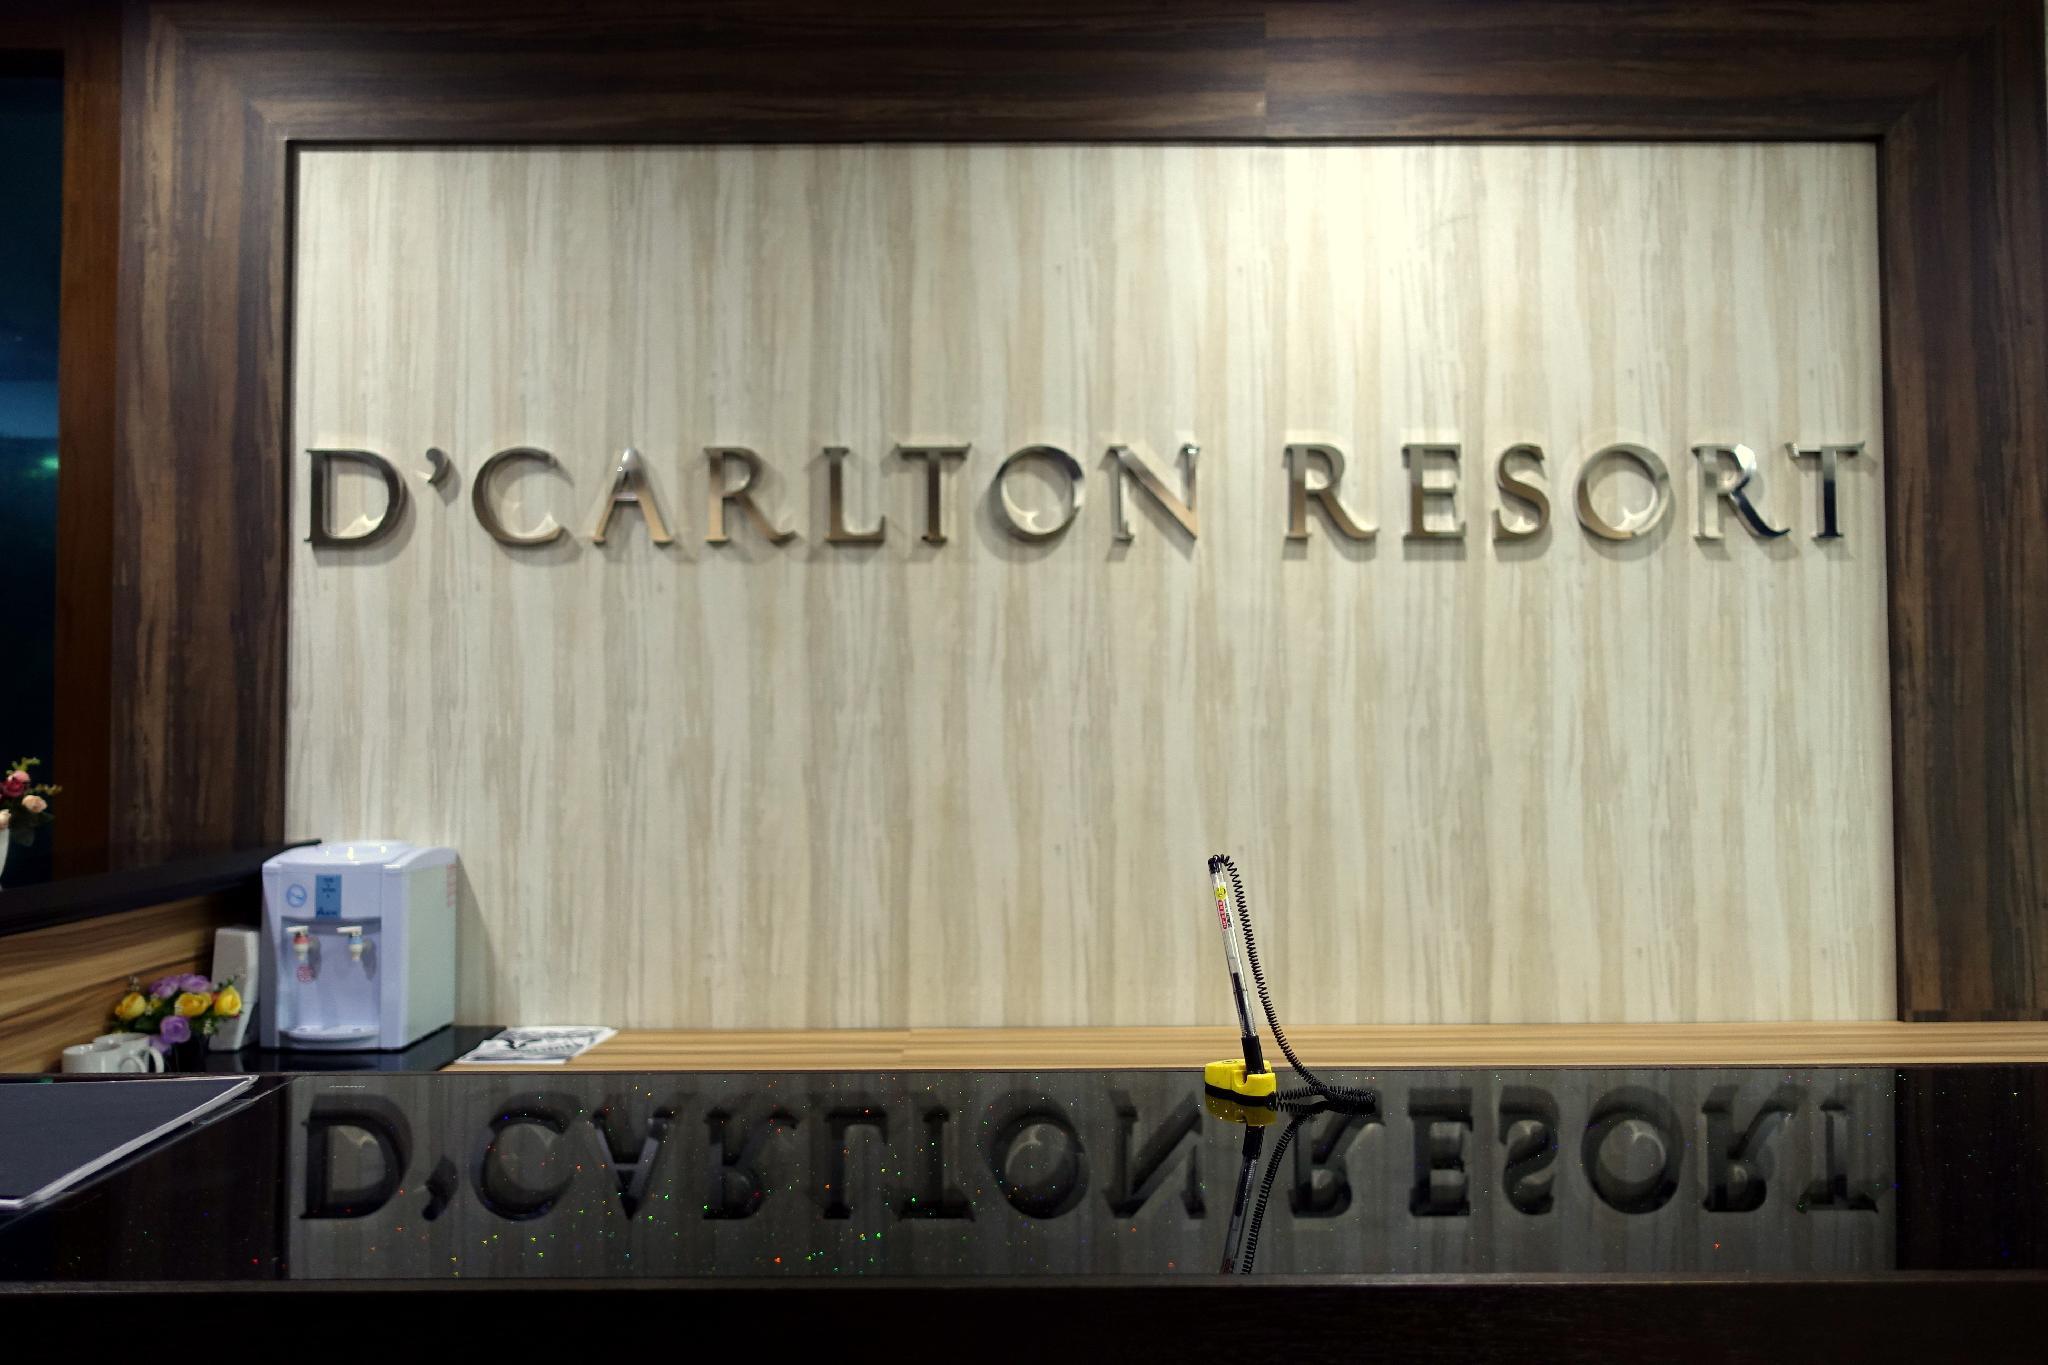 D'carlton Resort